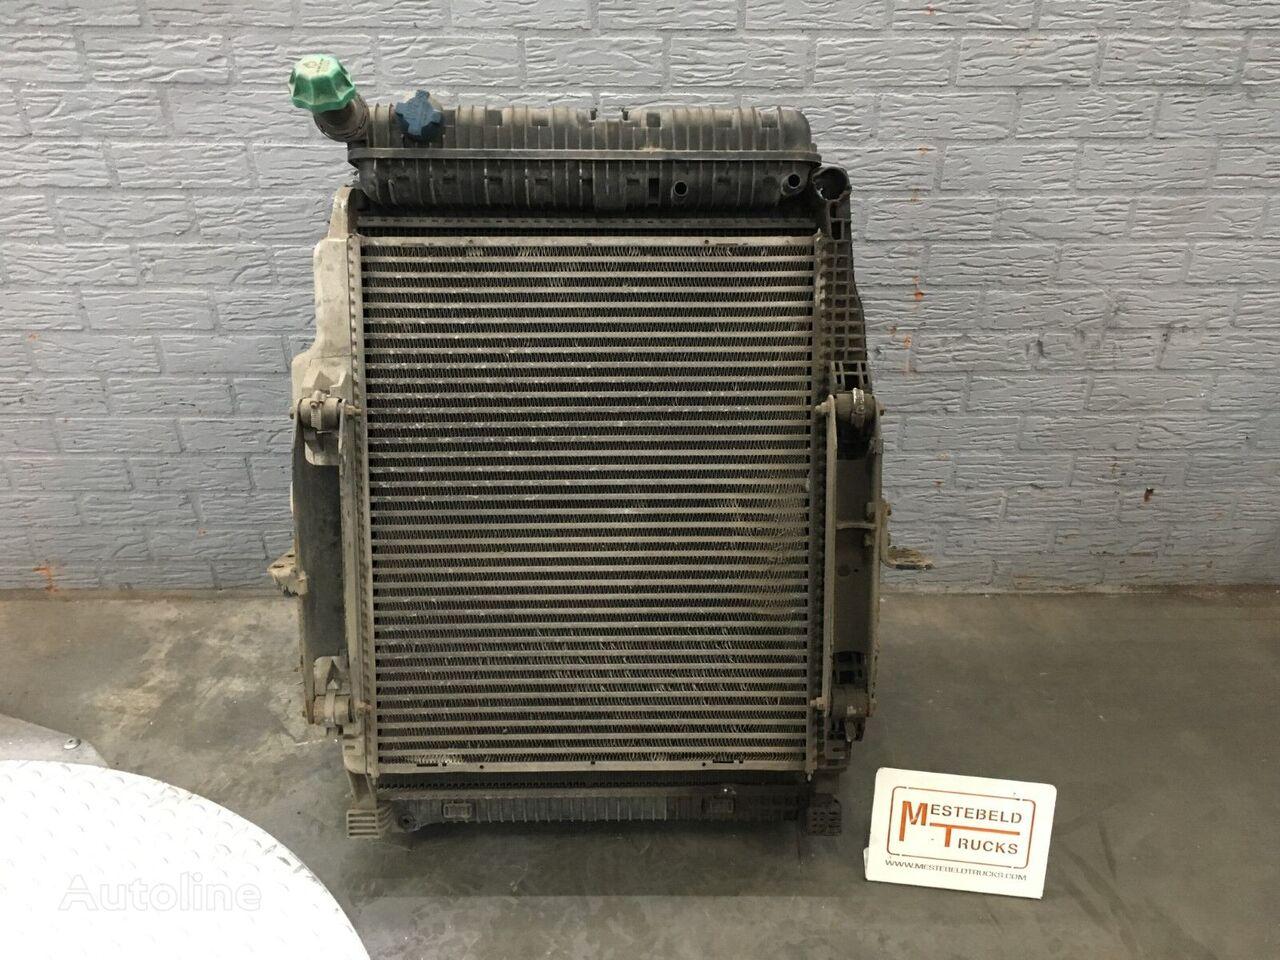 MERCEDES-BENZ Radiateur compleet engine cooling radiator for MERCEDES-BENZ truck